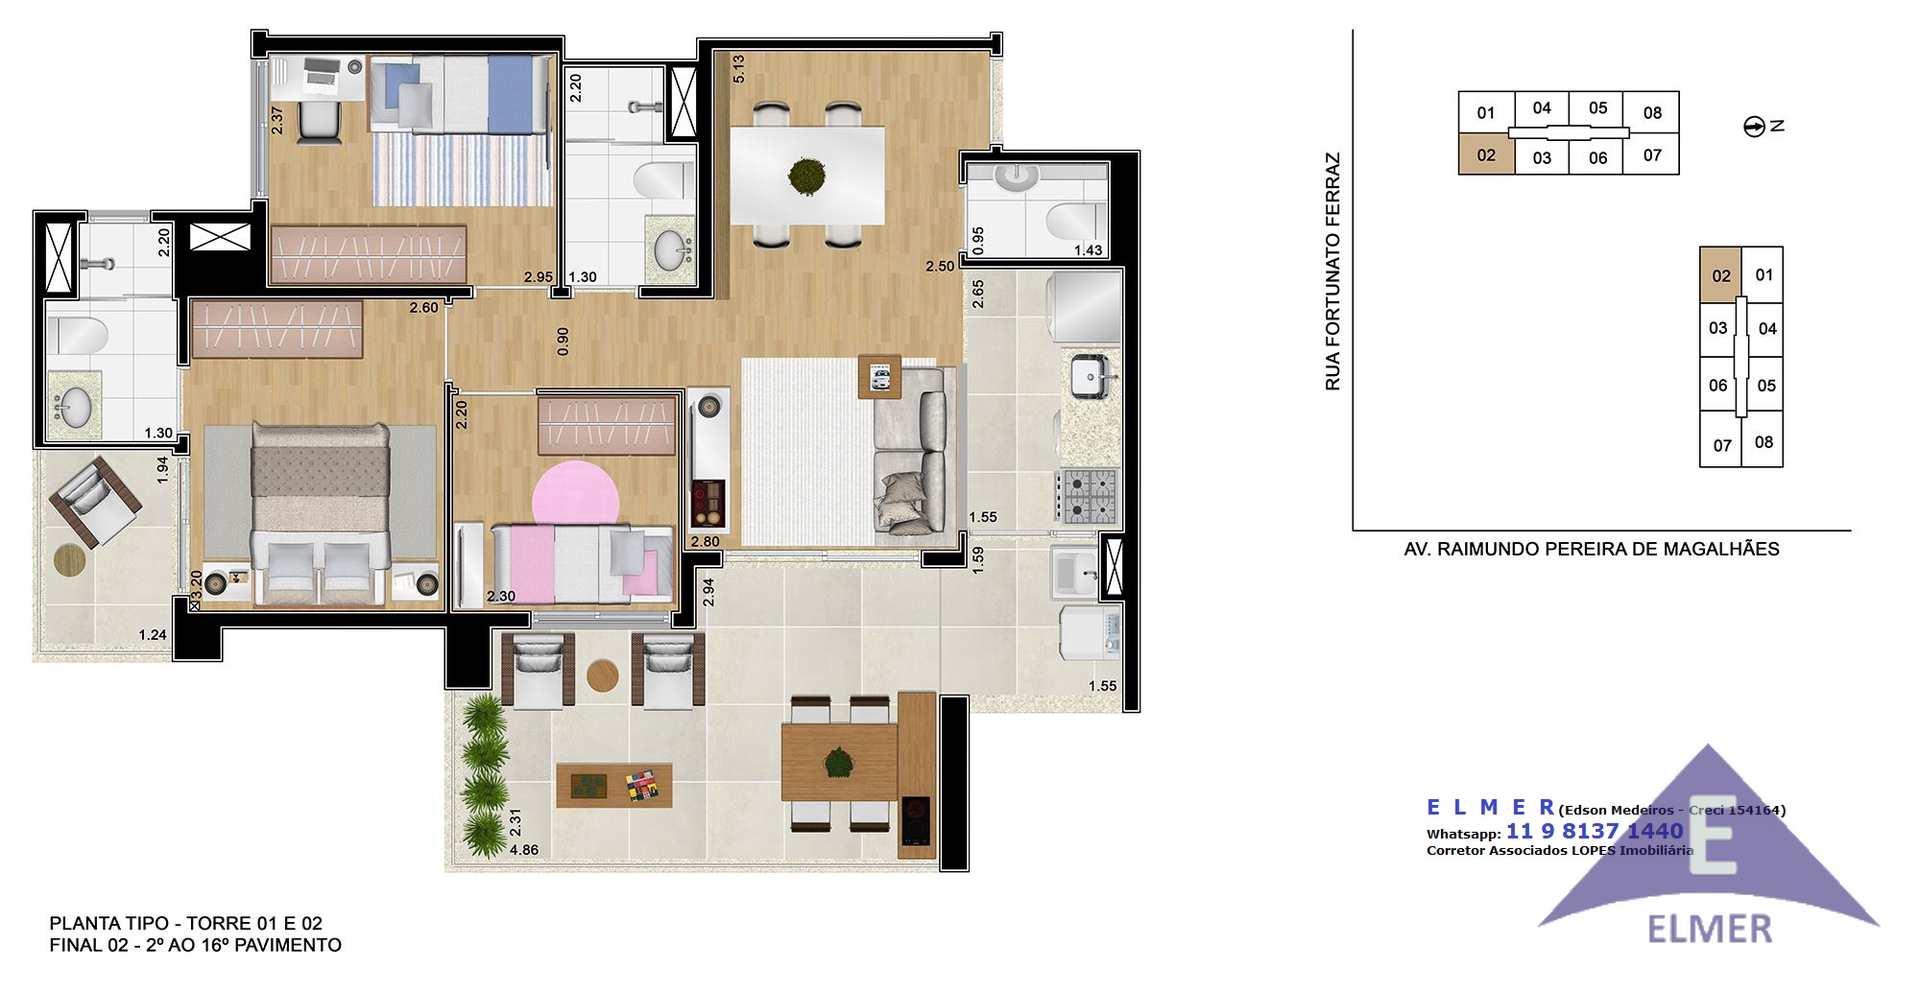 Planta 79 m² - Elmer